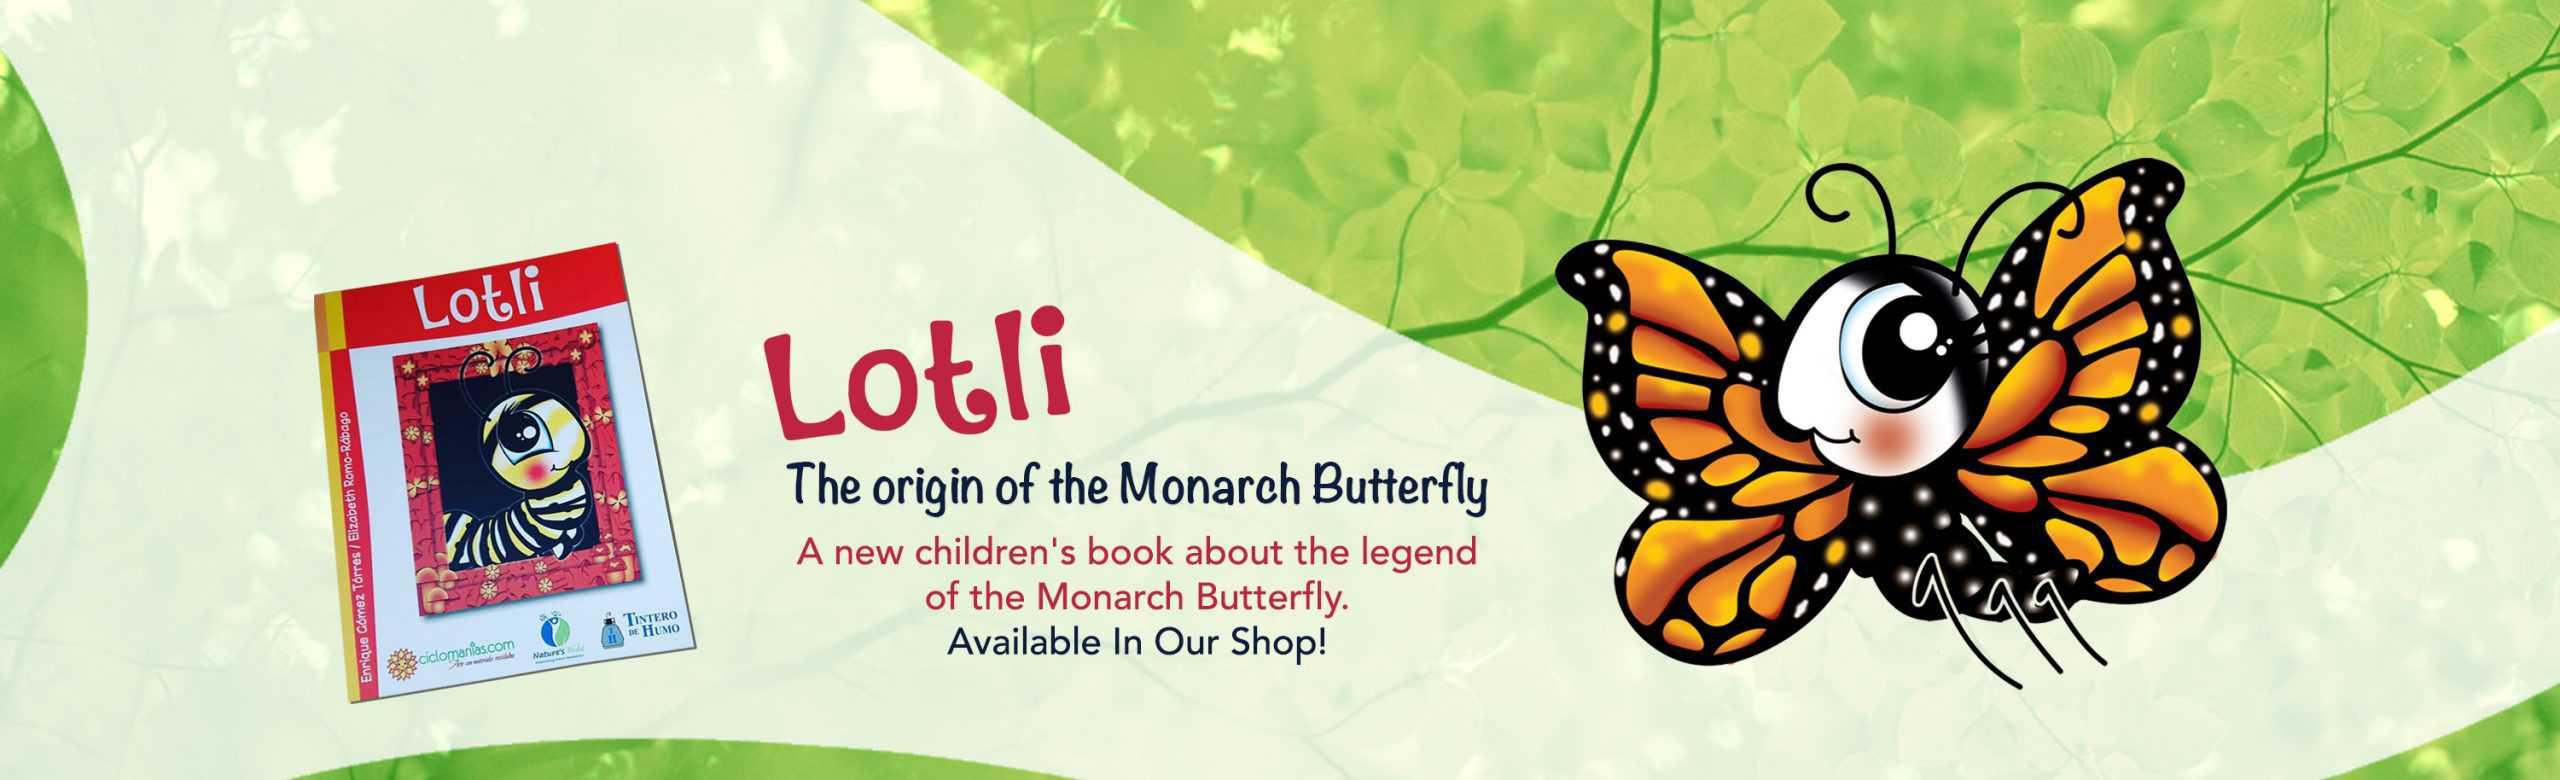 Lotli, The origin of the Monarch Butterfly-Children's book